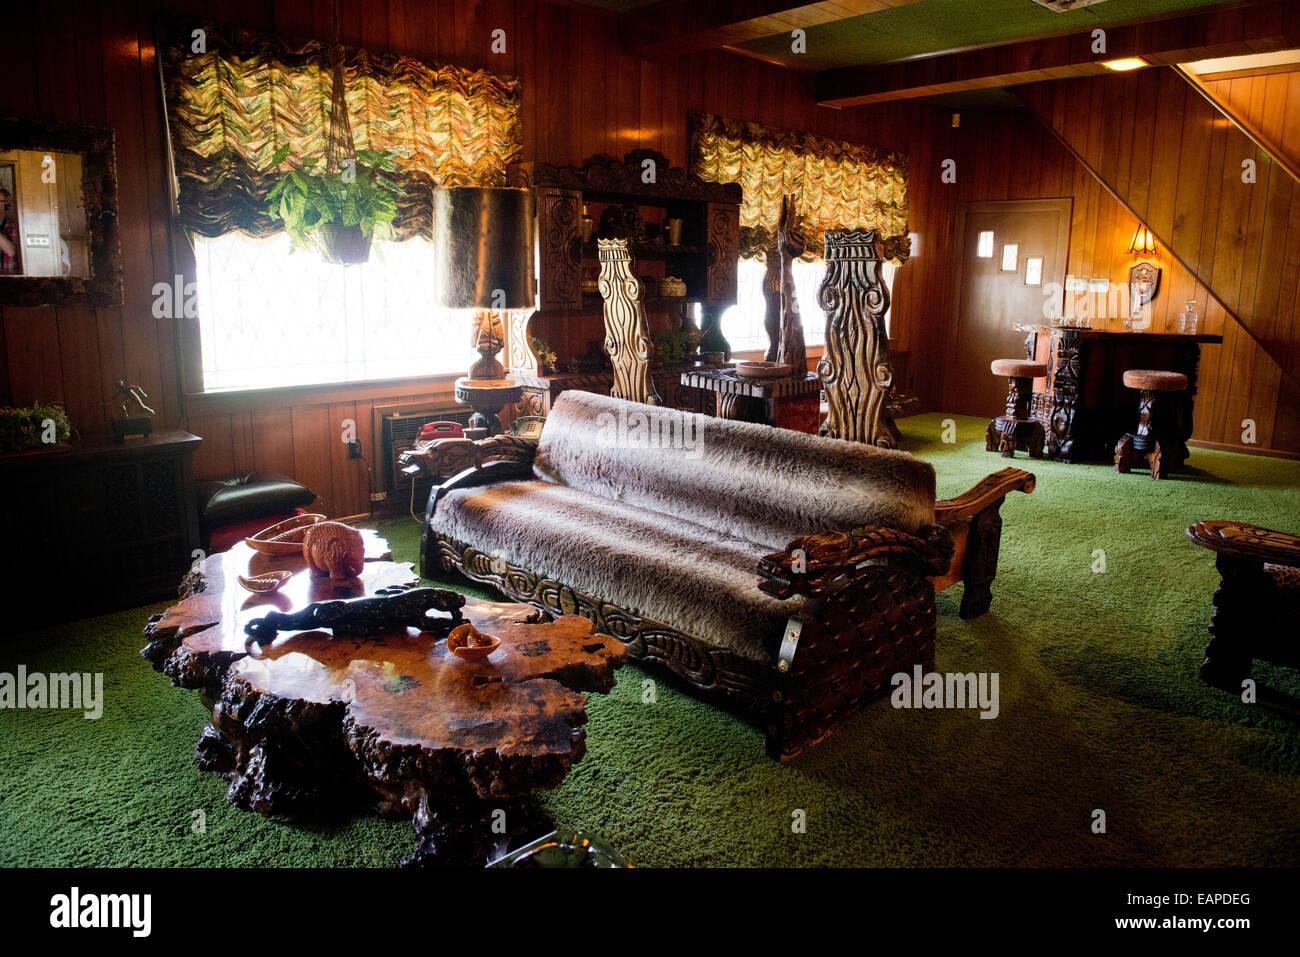 La Sala de la selva. Graceland, Memphis Tennessee Imagen De Stock